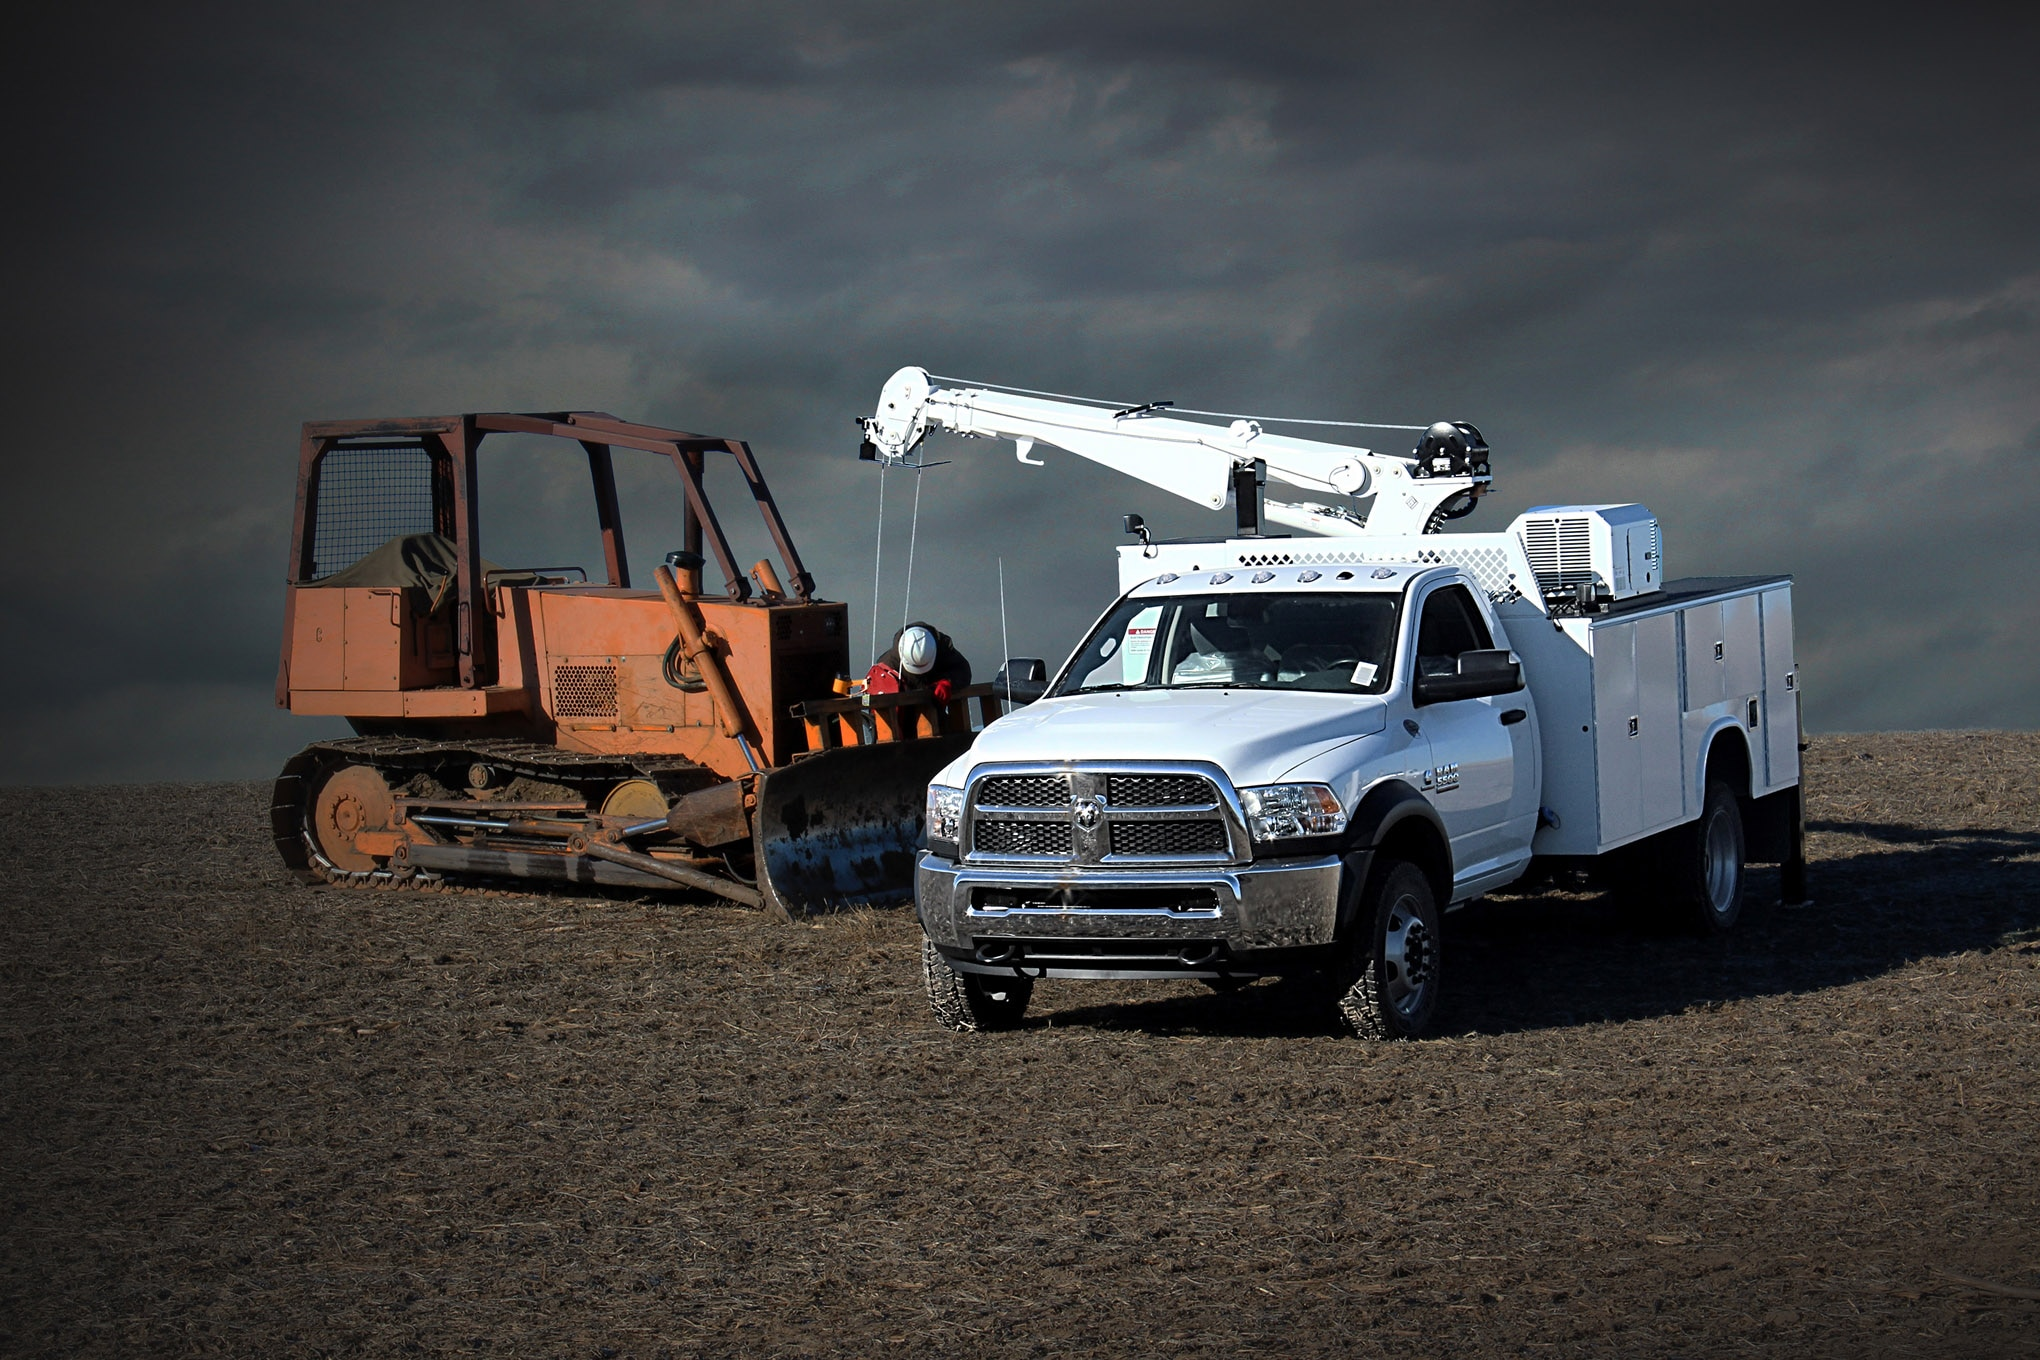 techline ram truck chassis cab 4500 5500 options pto upfitter